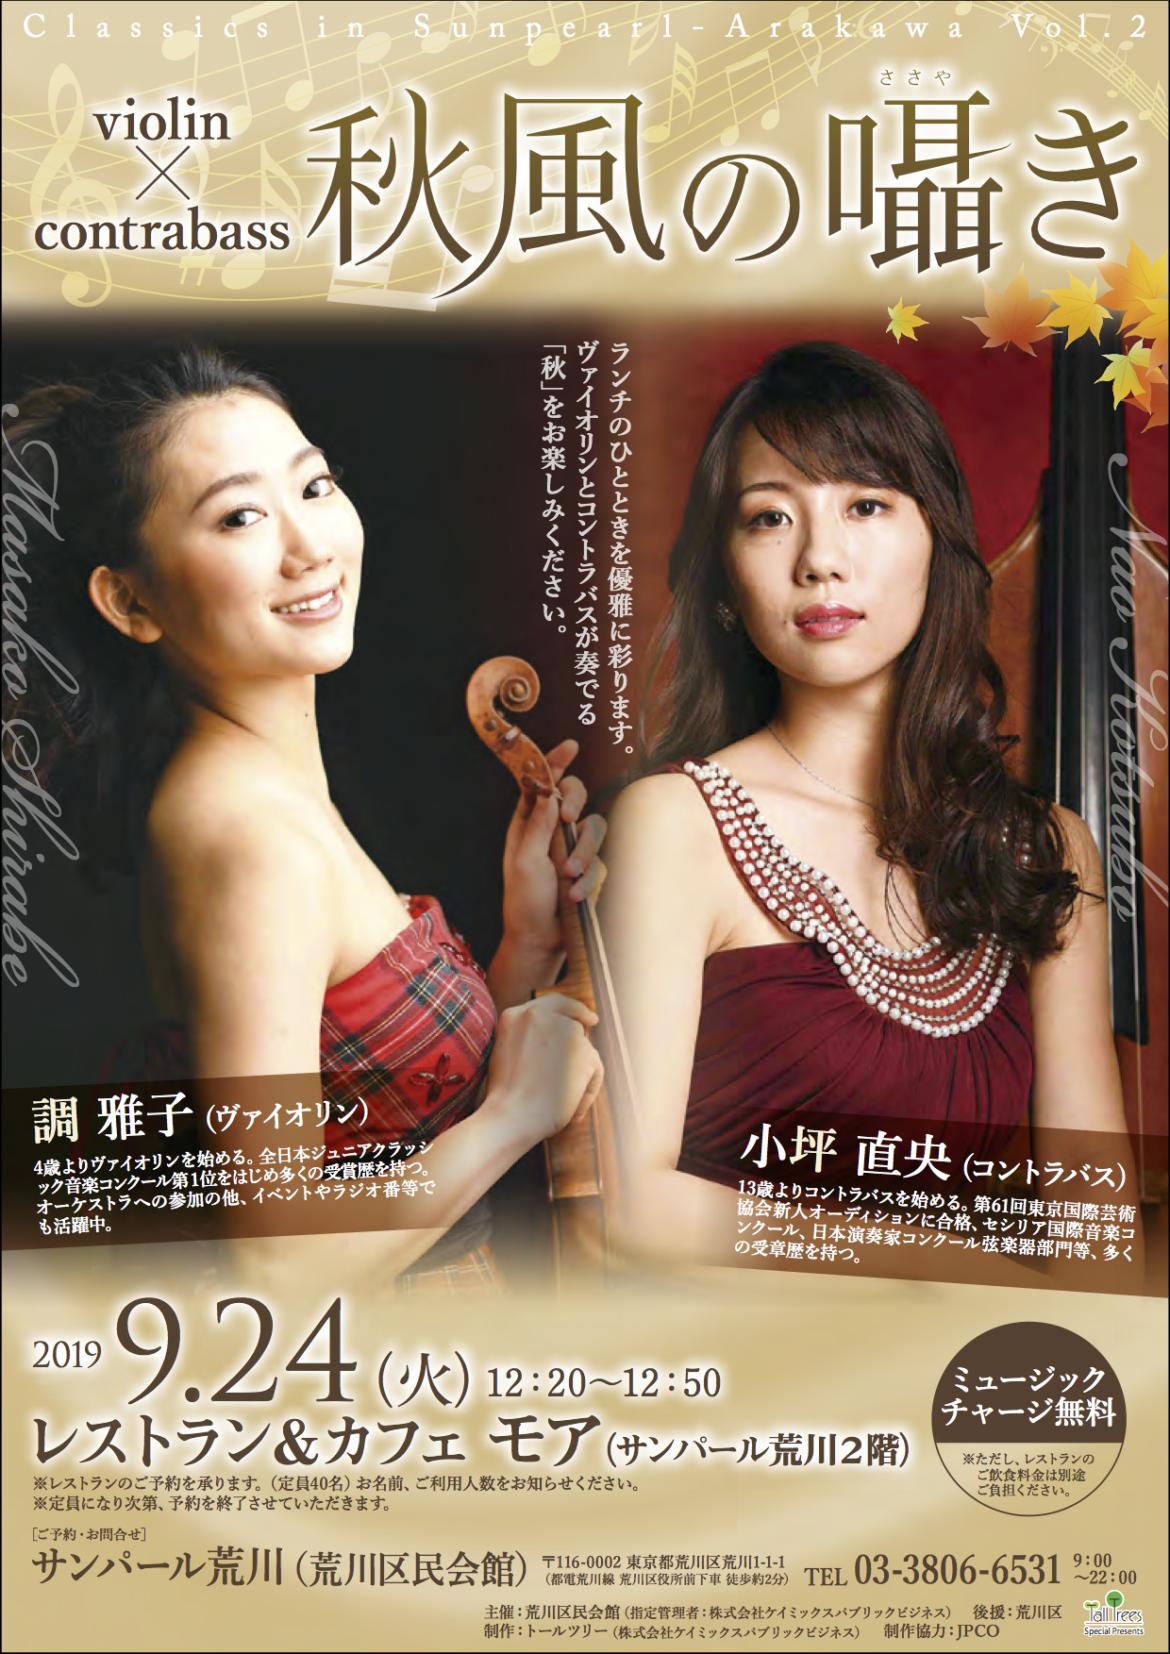 2019.9.24 Classics in Sunpearl-Arakawa vol.2 『秋風の囁き』